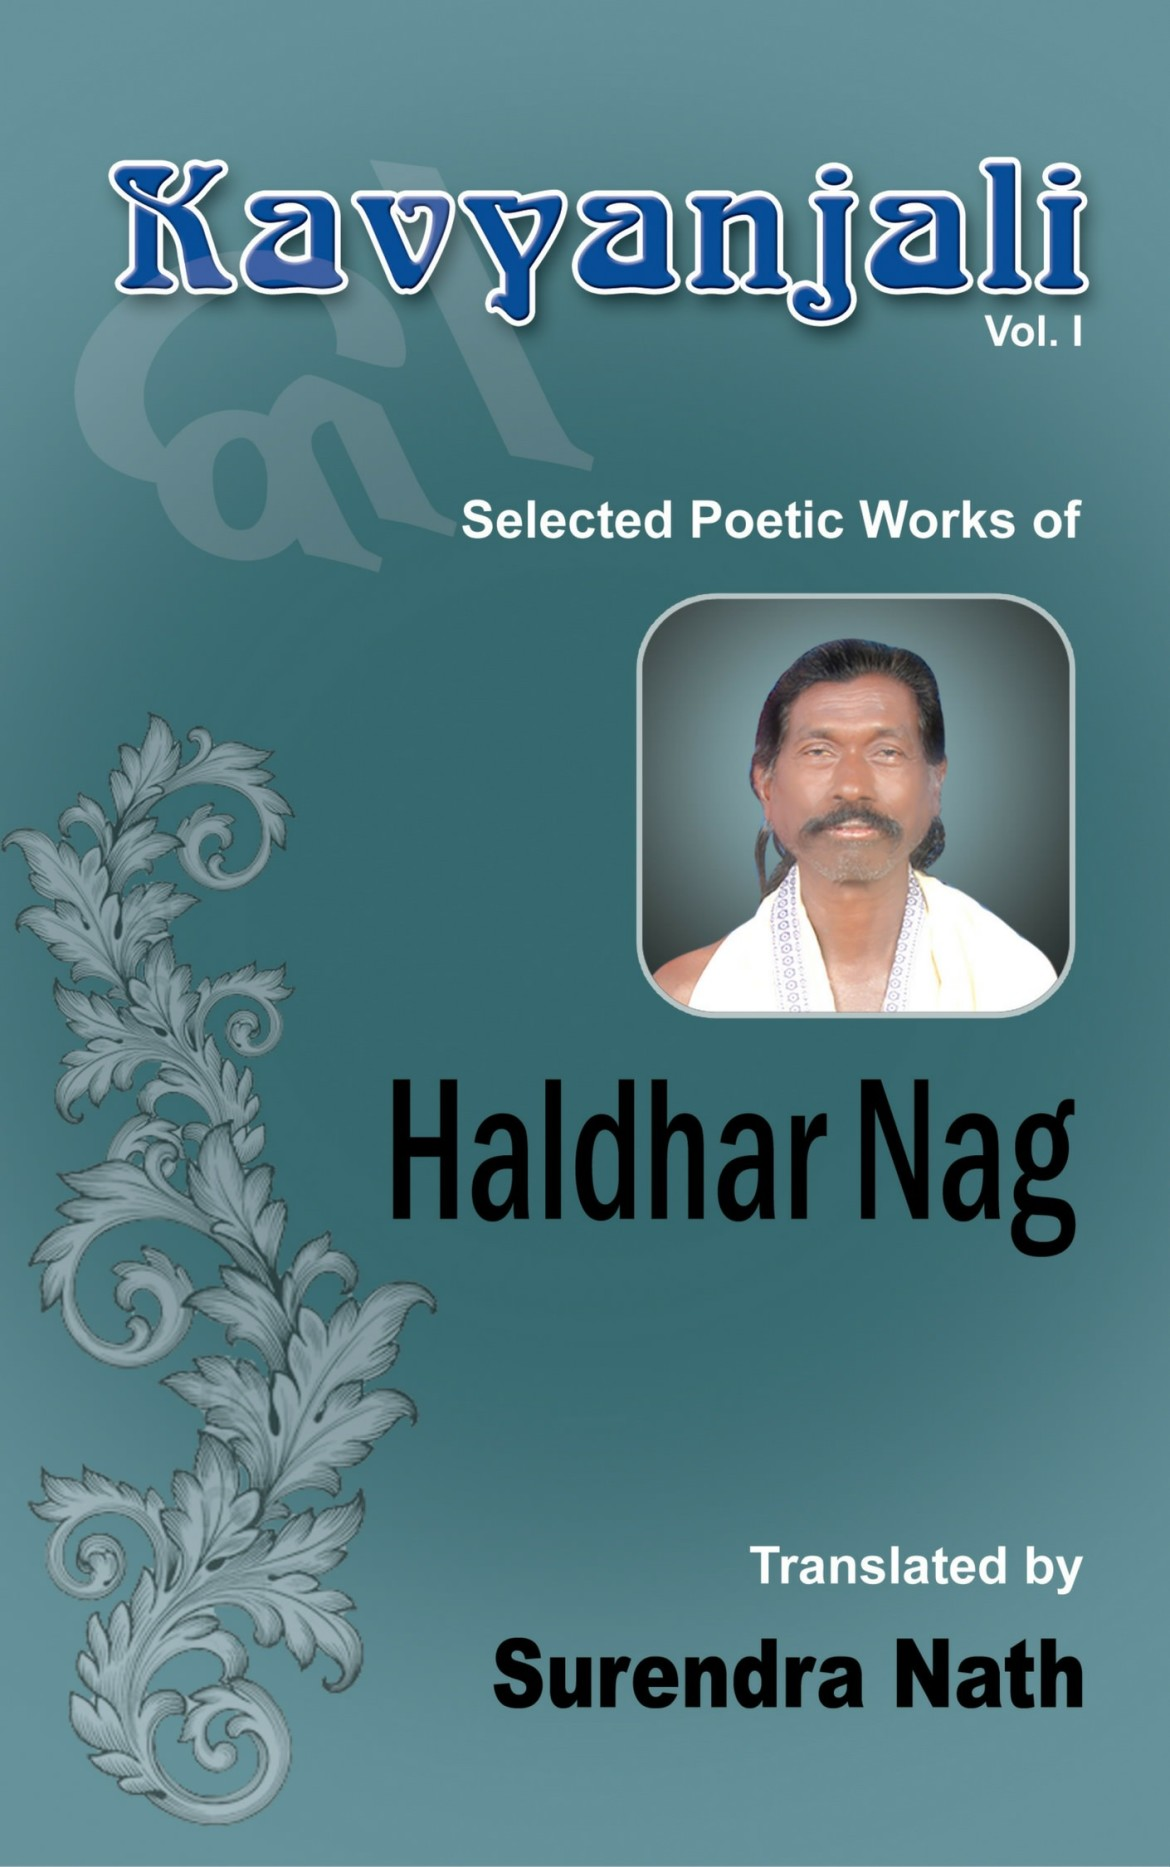 Project Kavyanjali: To Translate Padma Shri Haldhar Nag's